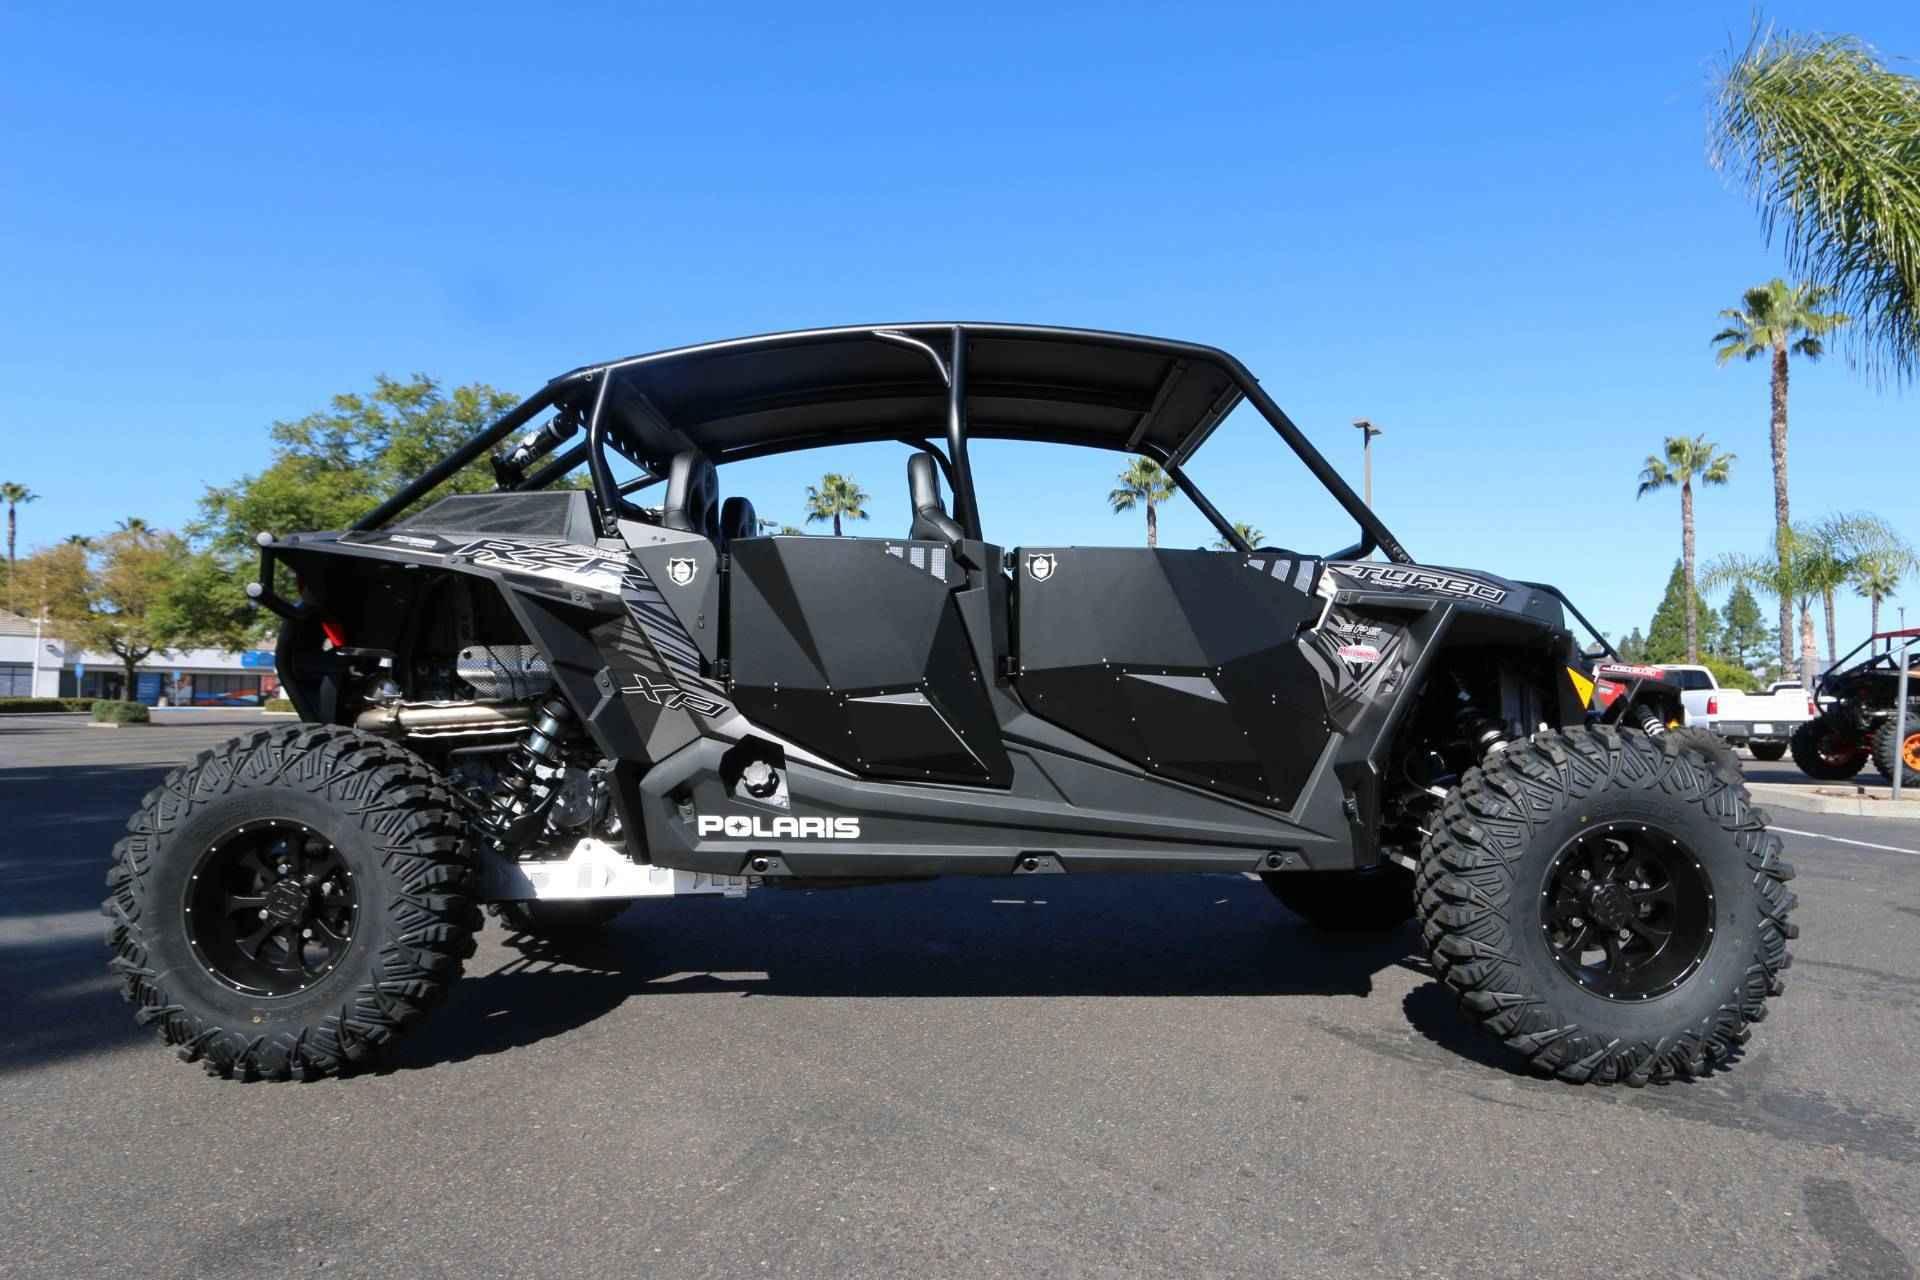 Yamaha For Sale Florida >> New 2017 Polaris RZR XP® 4 Turbo EPS ATVs For Sale in California on ATV Trades